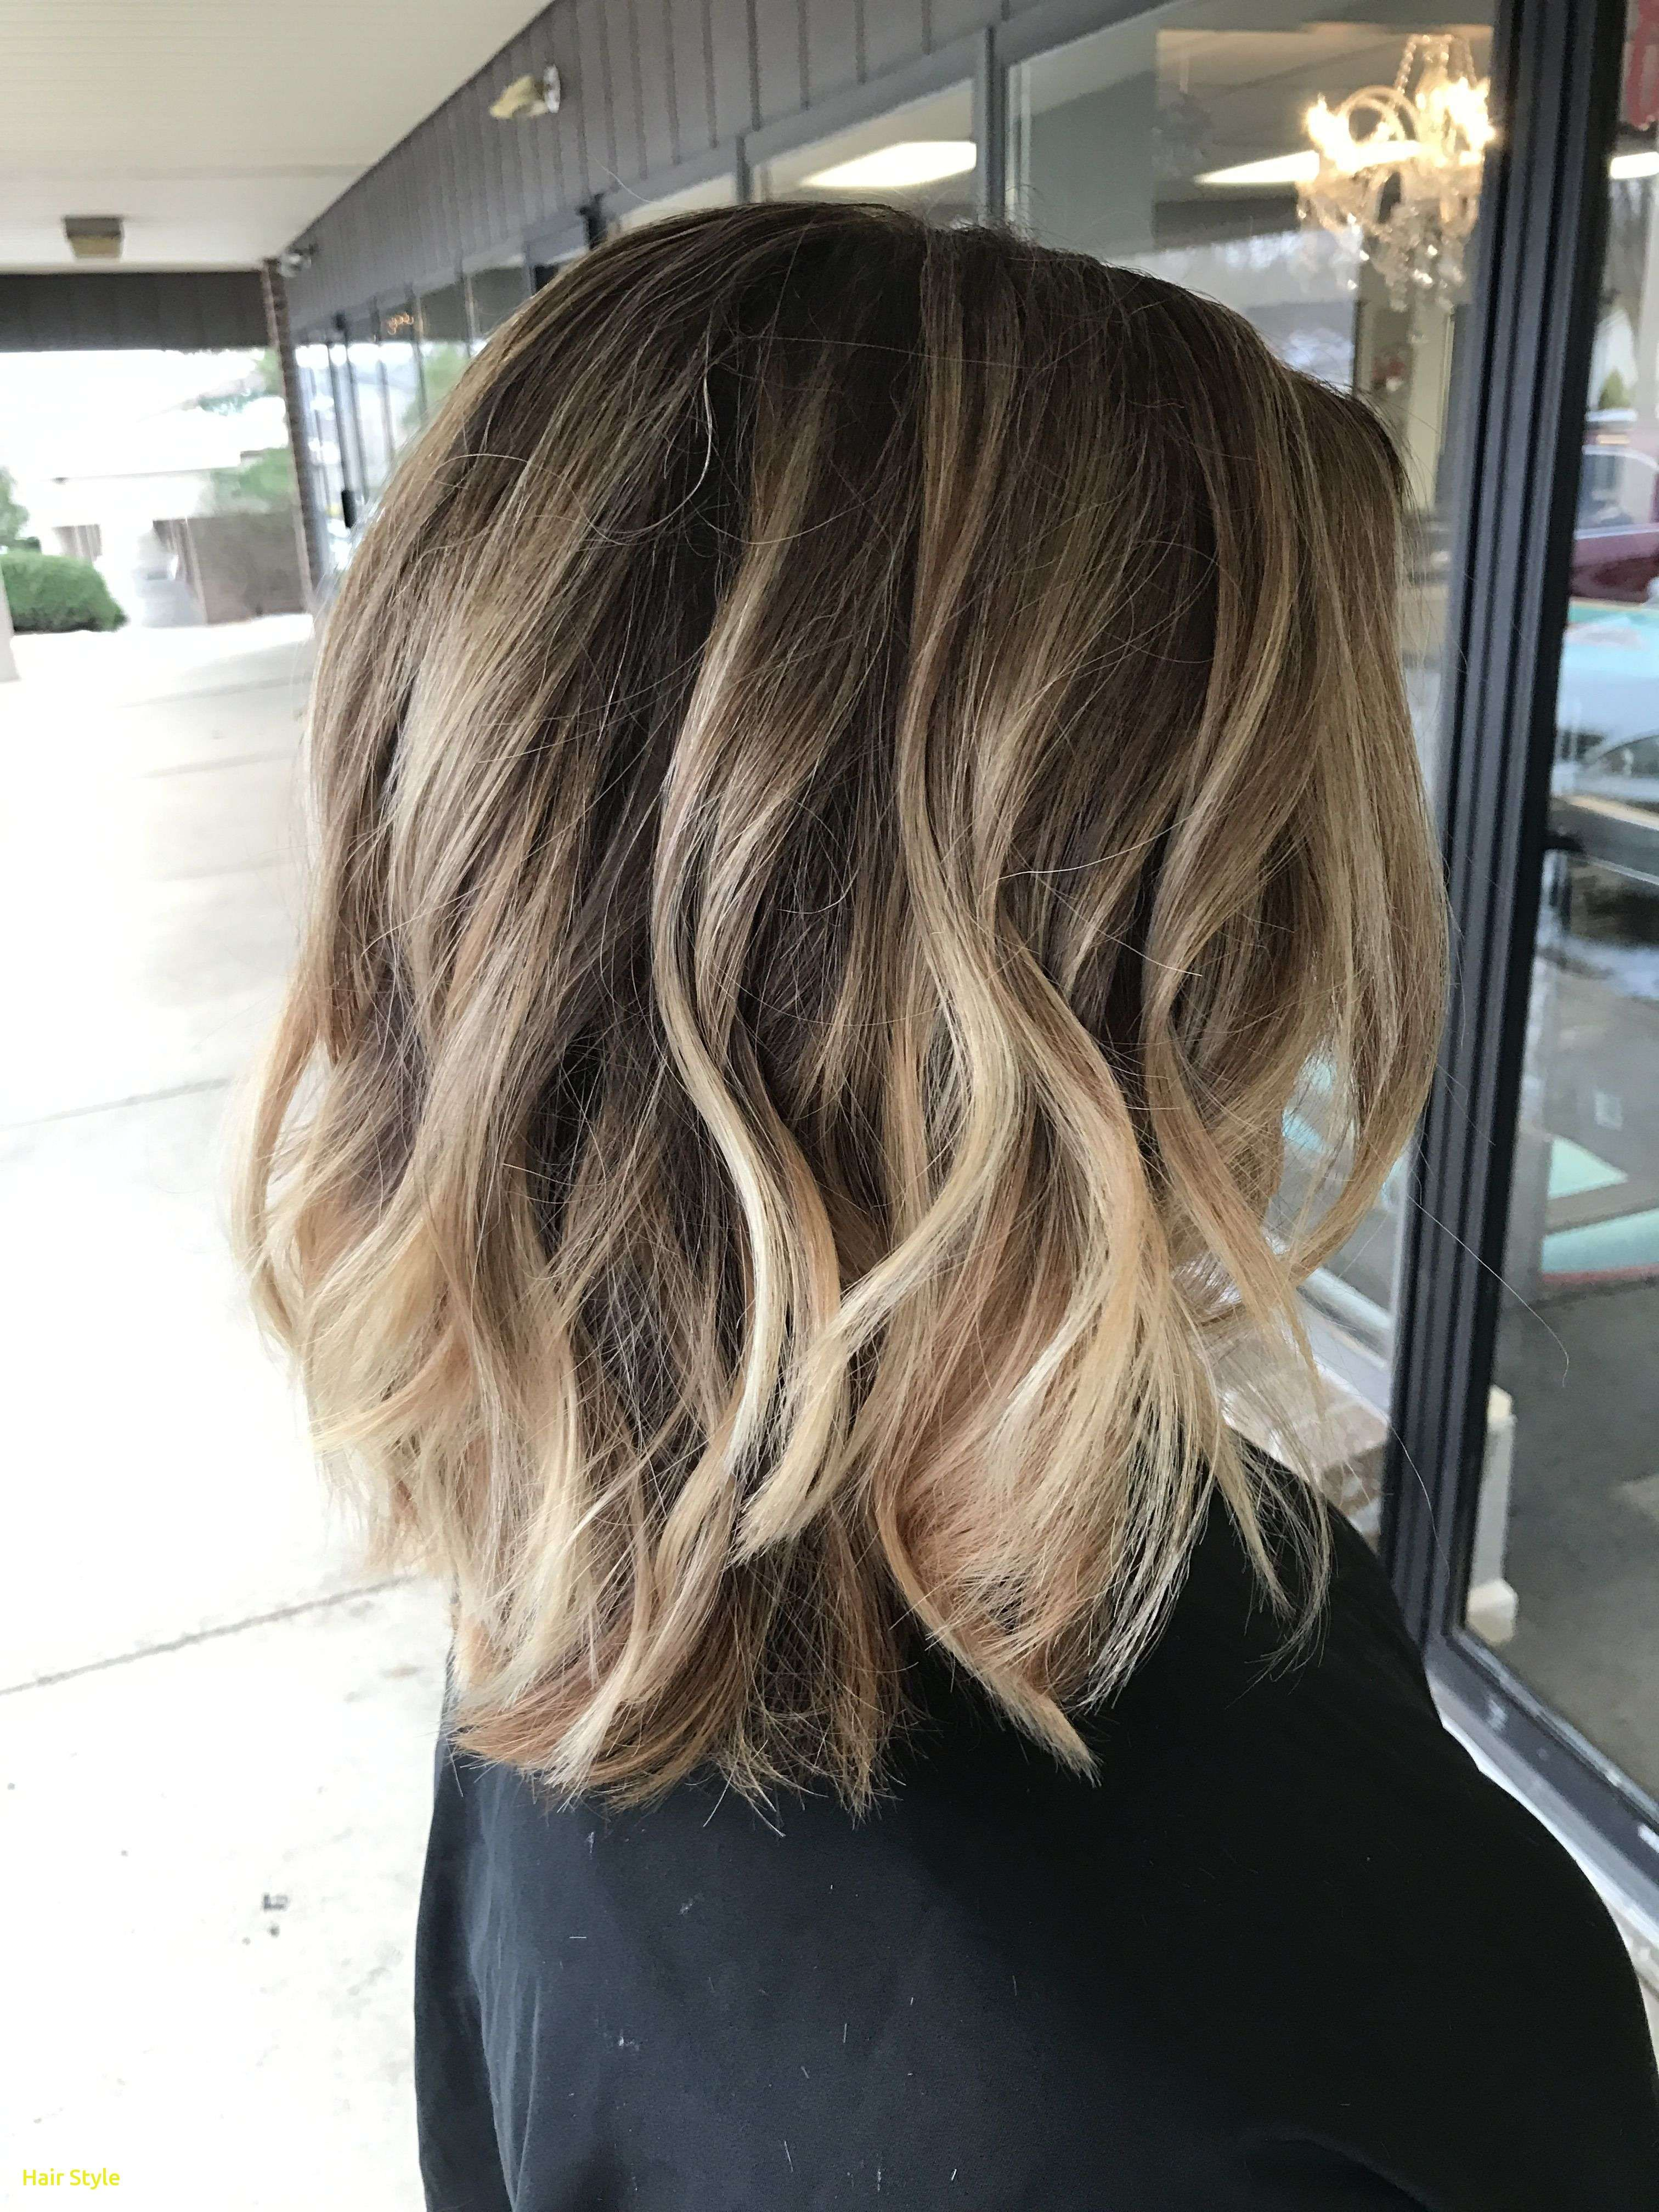 Frische Haarfarbe Trends Balayage Neu Haarschnitte 2019